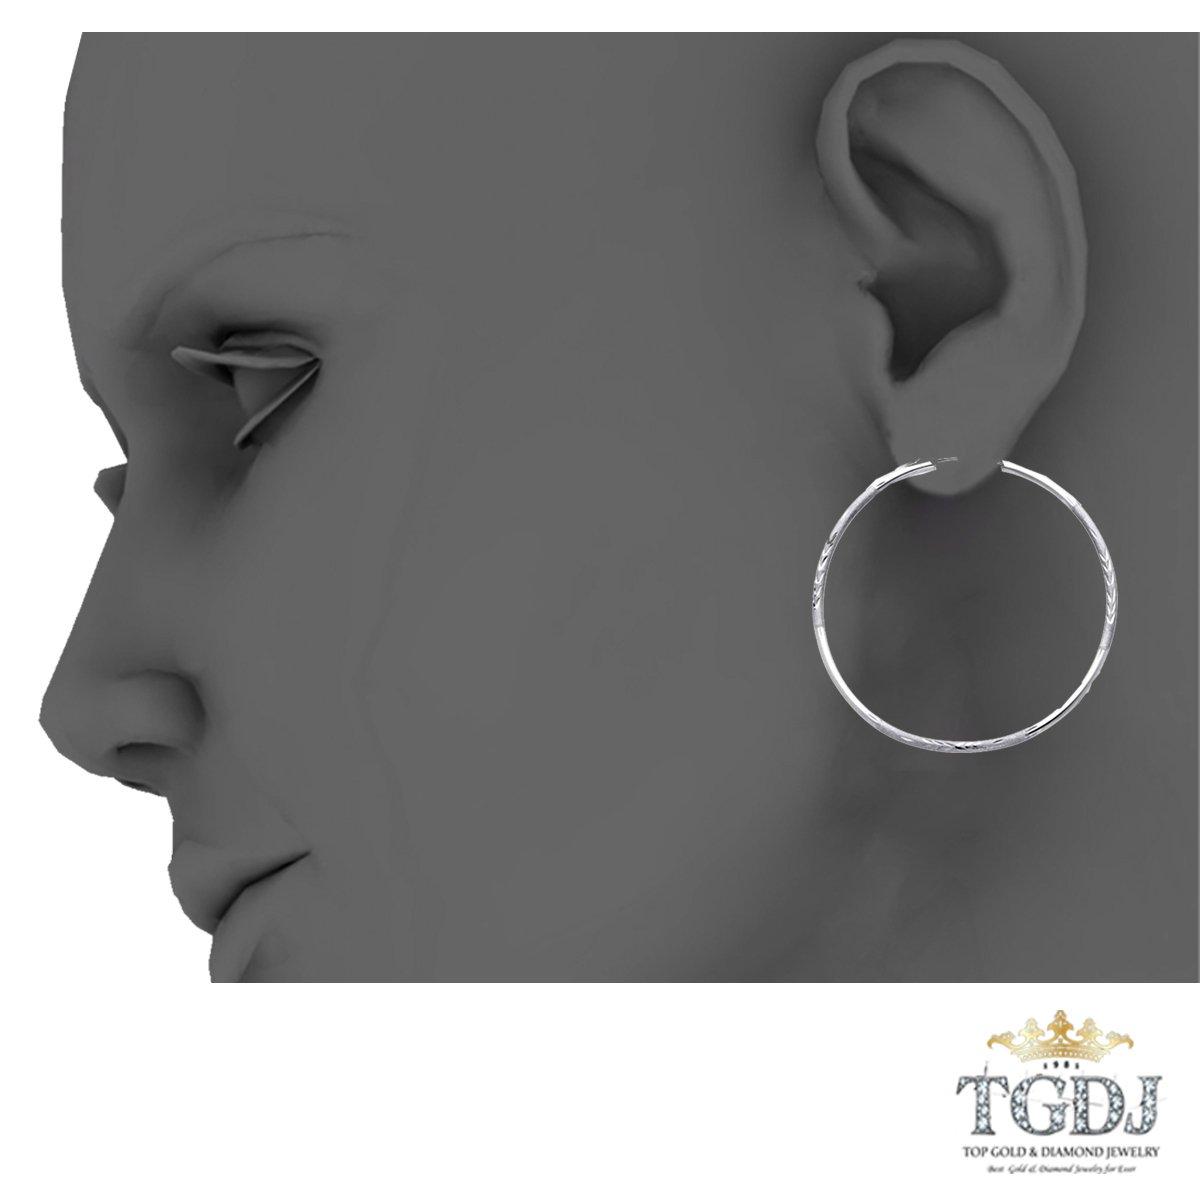 14k White Gold 2mm Thickness Endless Diamond Cut Hoop Earrings Diameter 30mm